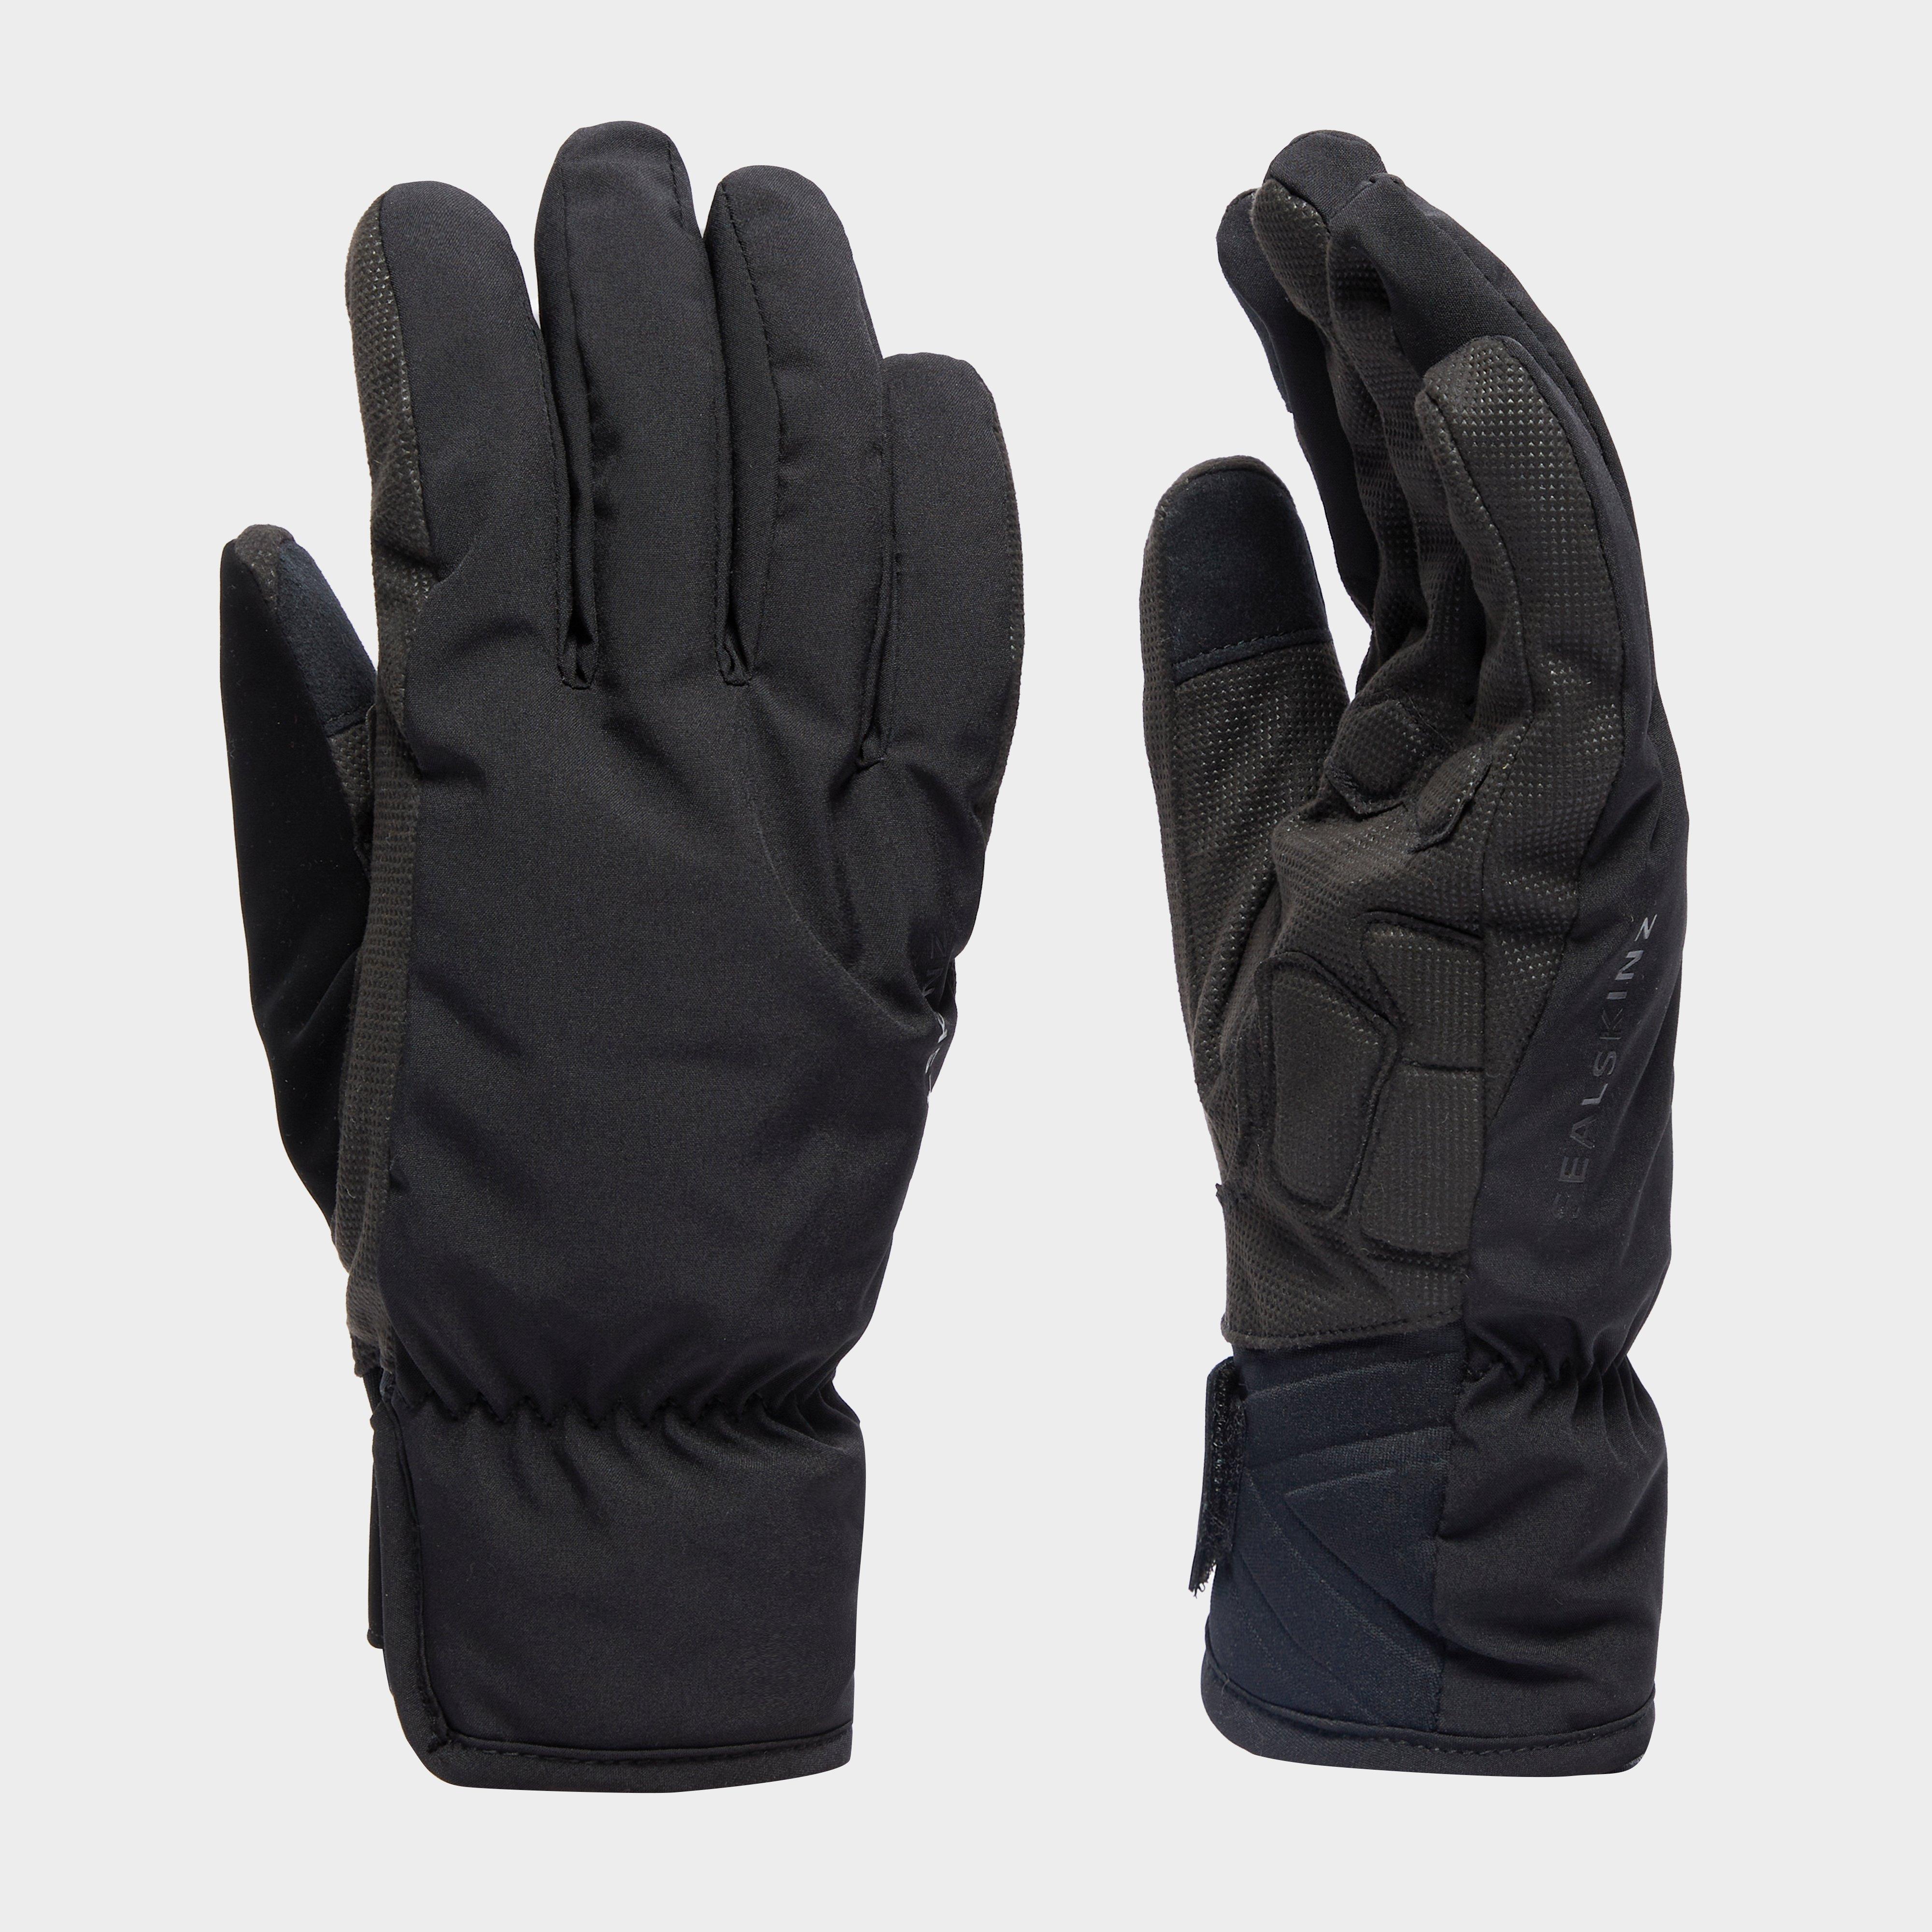 Sealskinz Men's Brecon Gloves - Black/Blk, Black